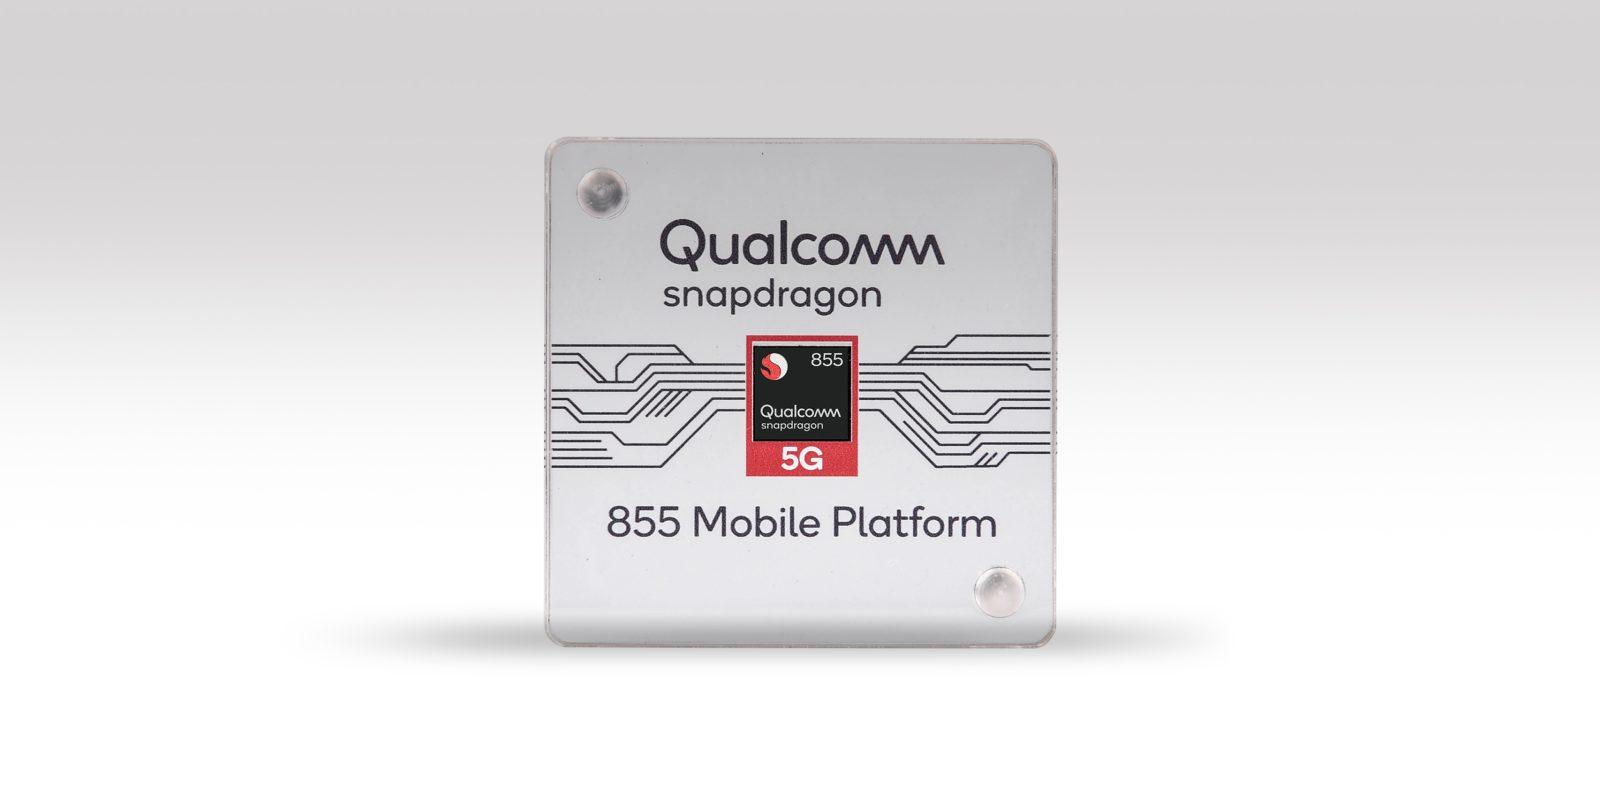 Qualcomm Snpadragon 855 Android